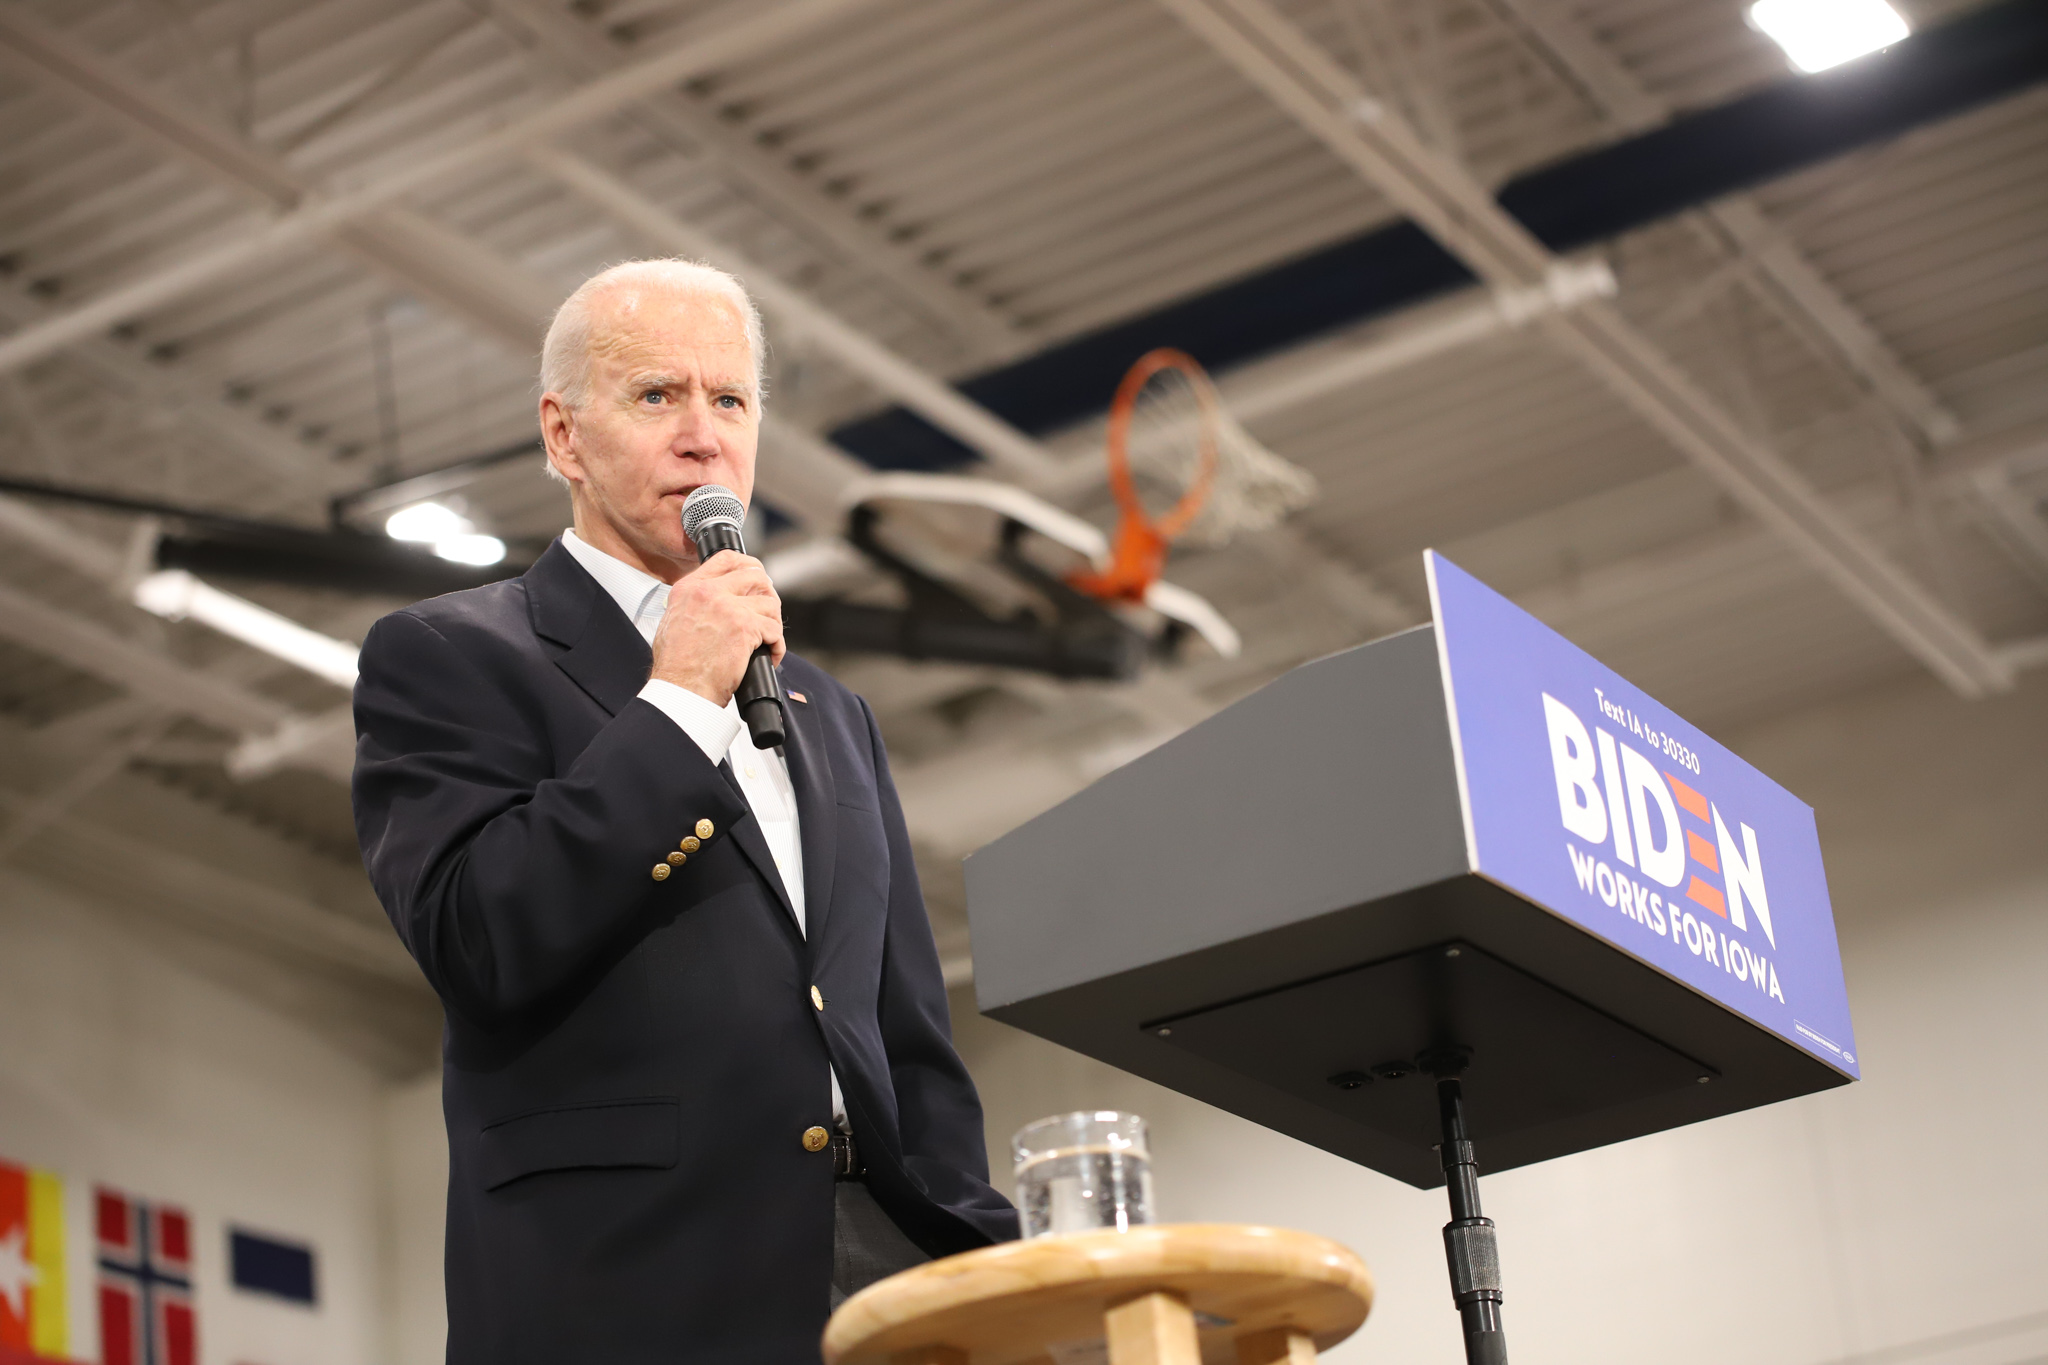 Biden speaking to Iowans. (Brita Hunegs, 14 East)